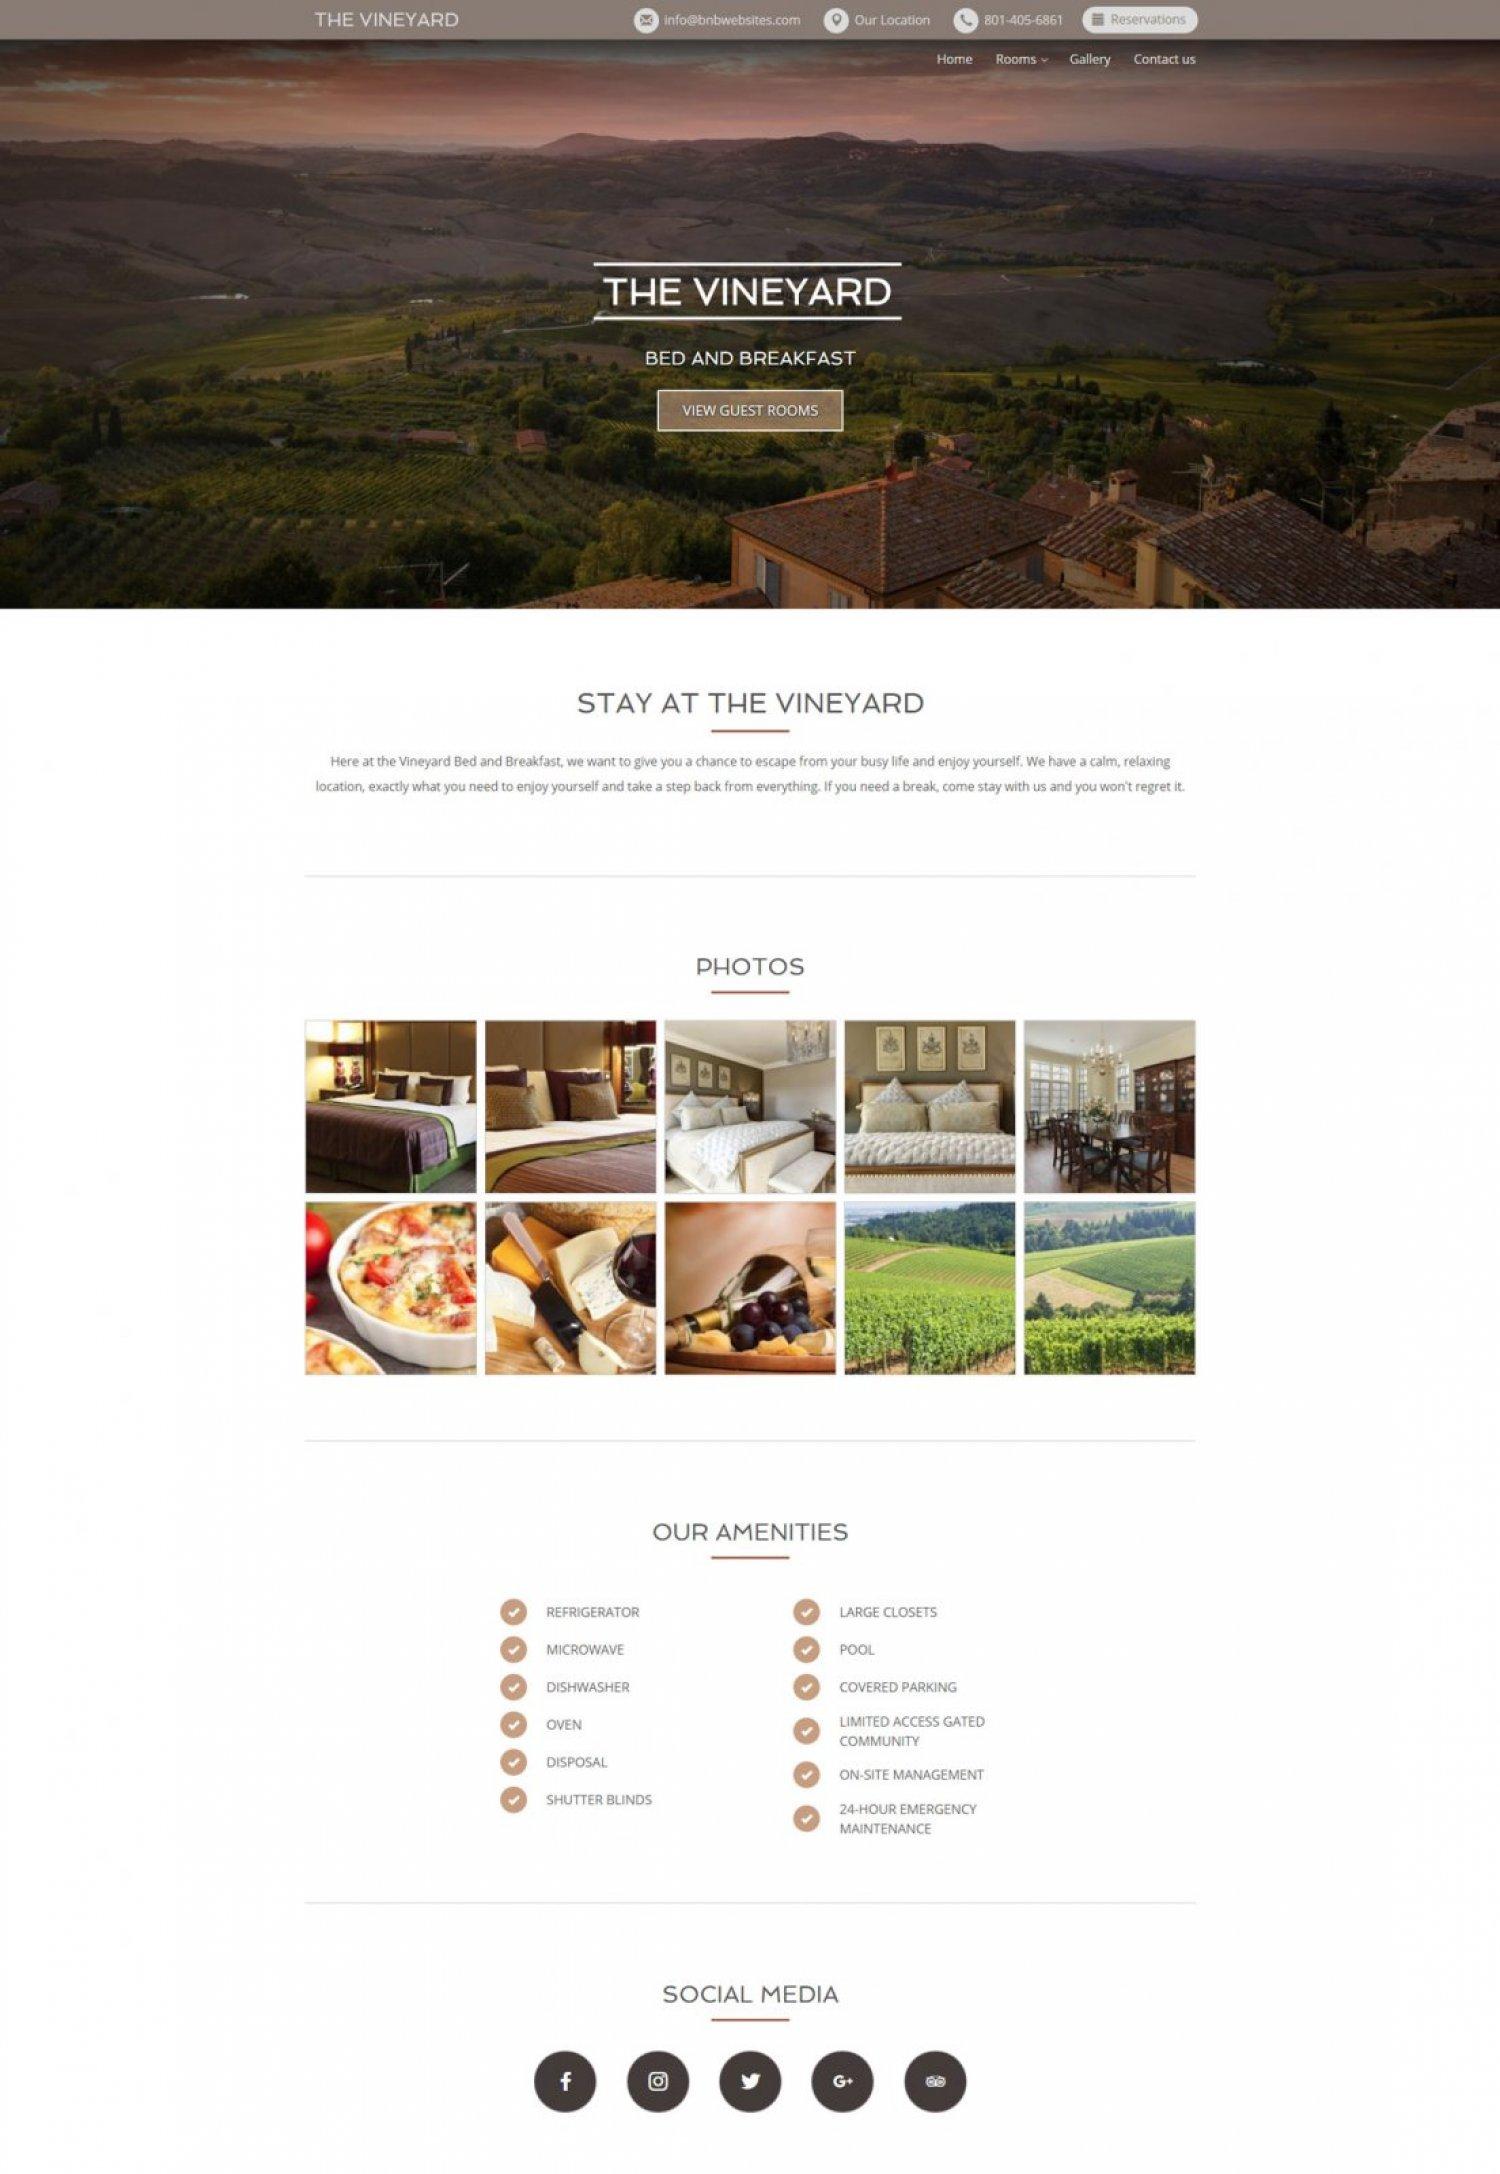 The Vineyard Web Design